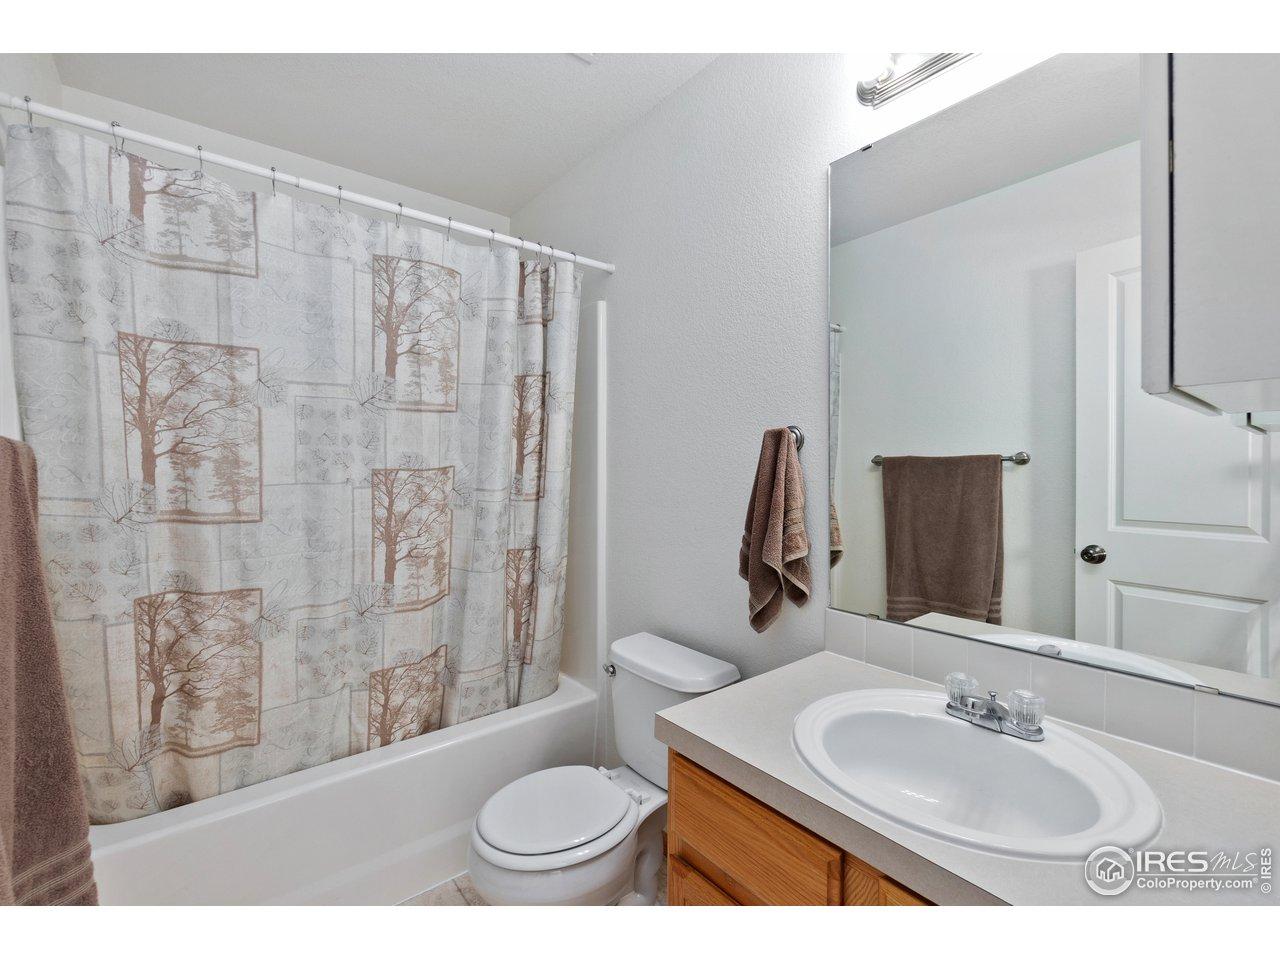 Second Upstairs Bathroom